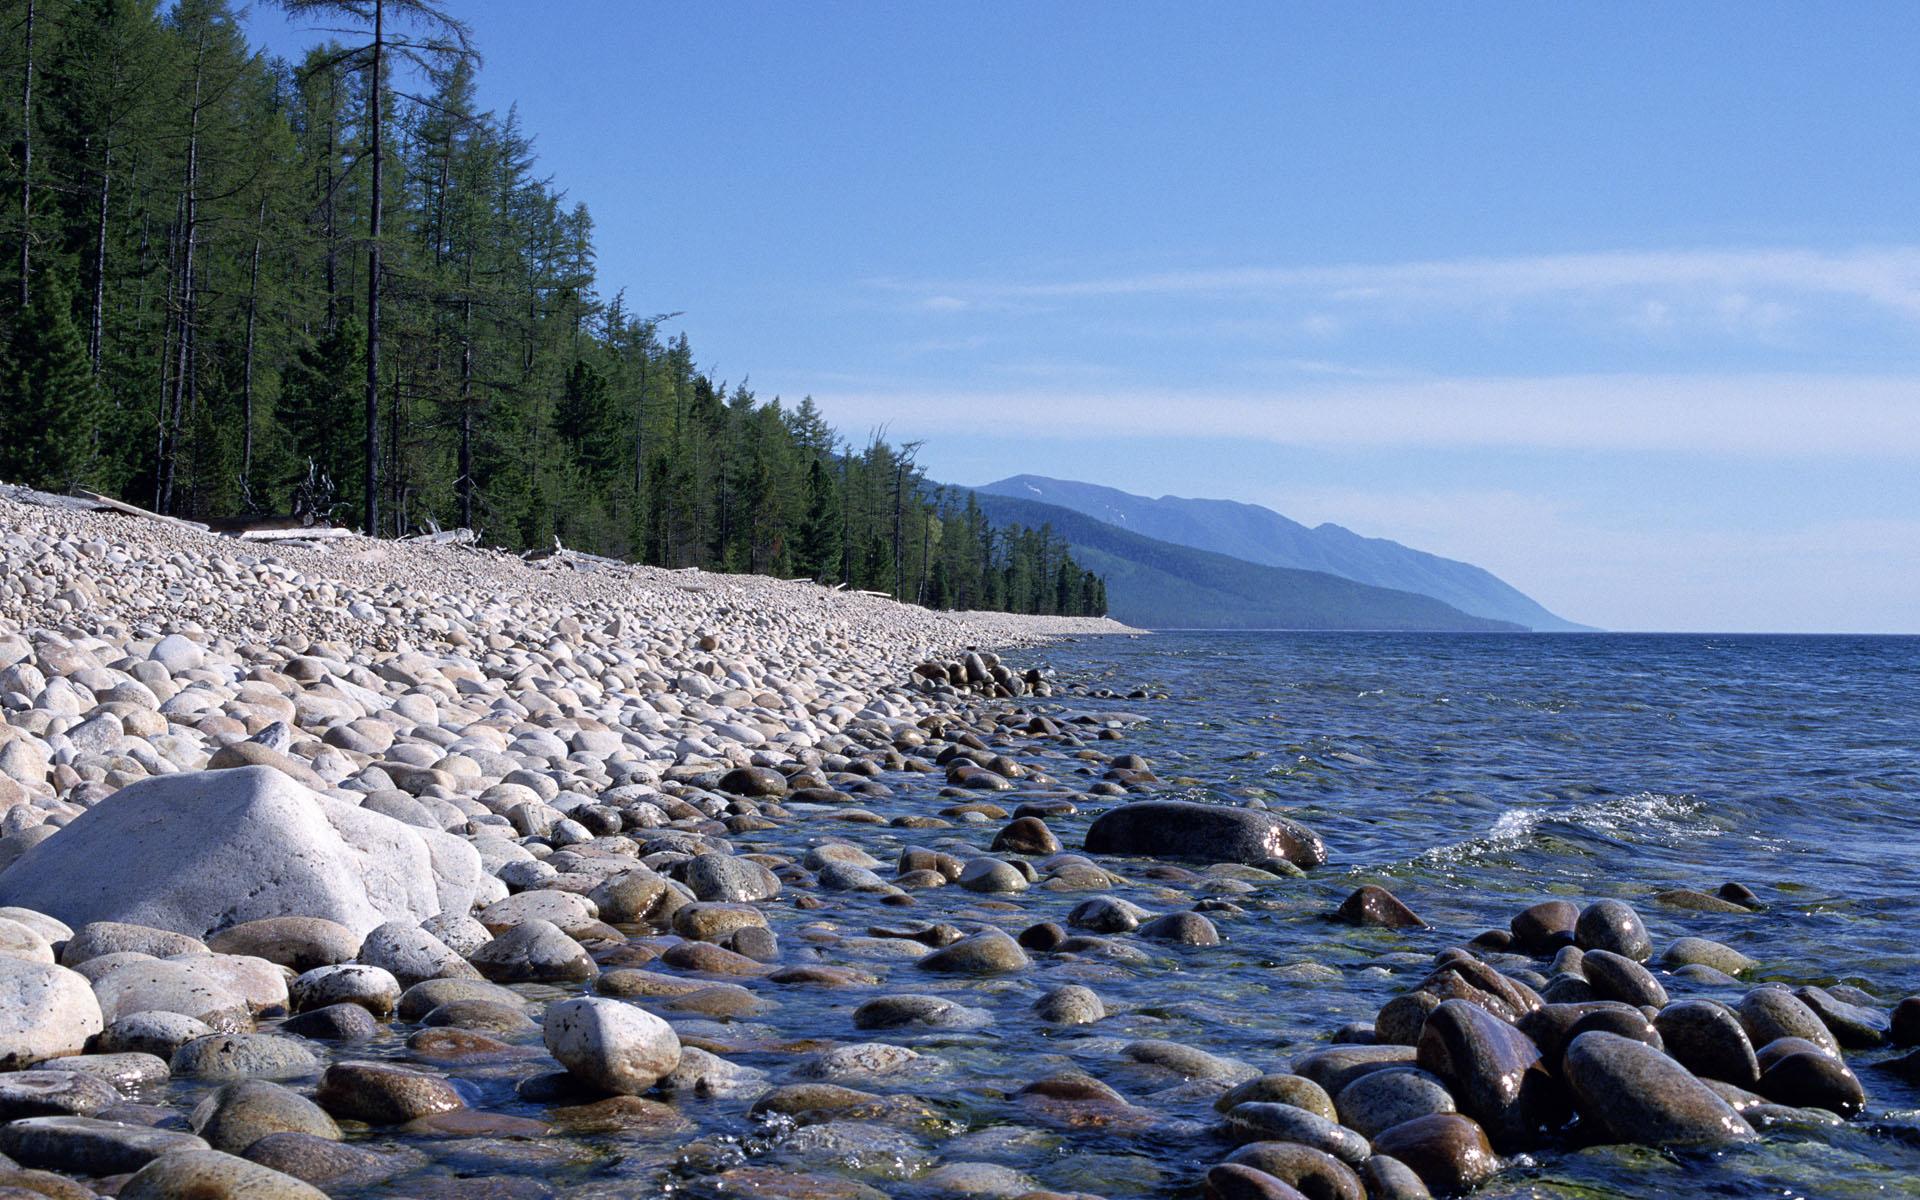 Озеро Байкал обои, скачать картинки на ...: www.wallplanet.ru/photo/priroda/ozero_bajkal/15-0-10655